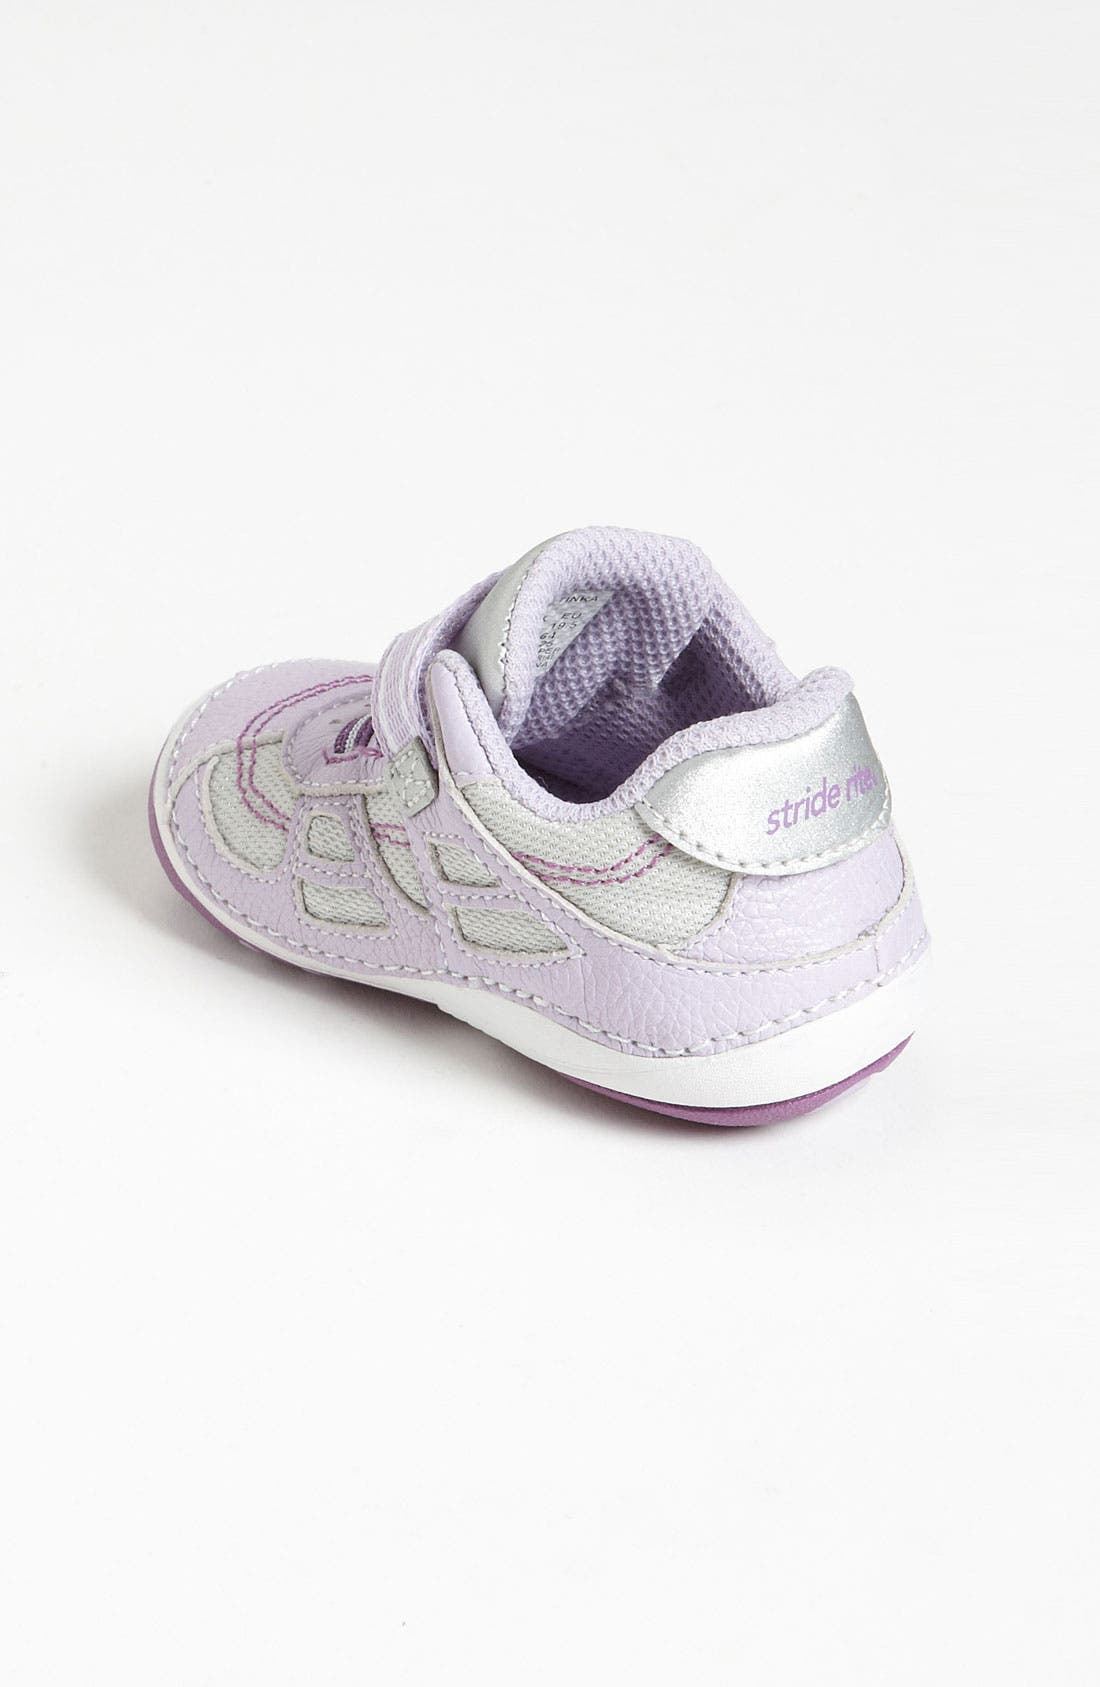 Alternate Image 2  - Stride Rite 'Tinka' Sneaker (Baby & Walker)